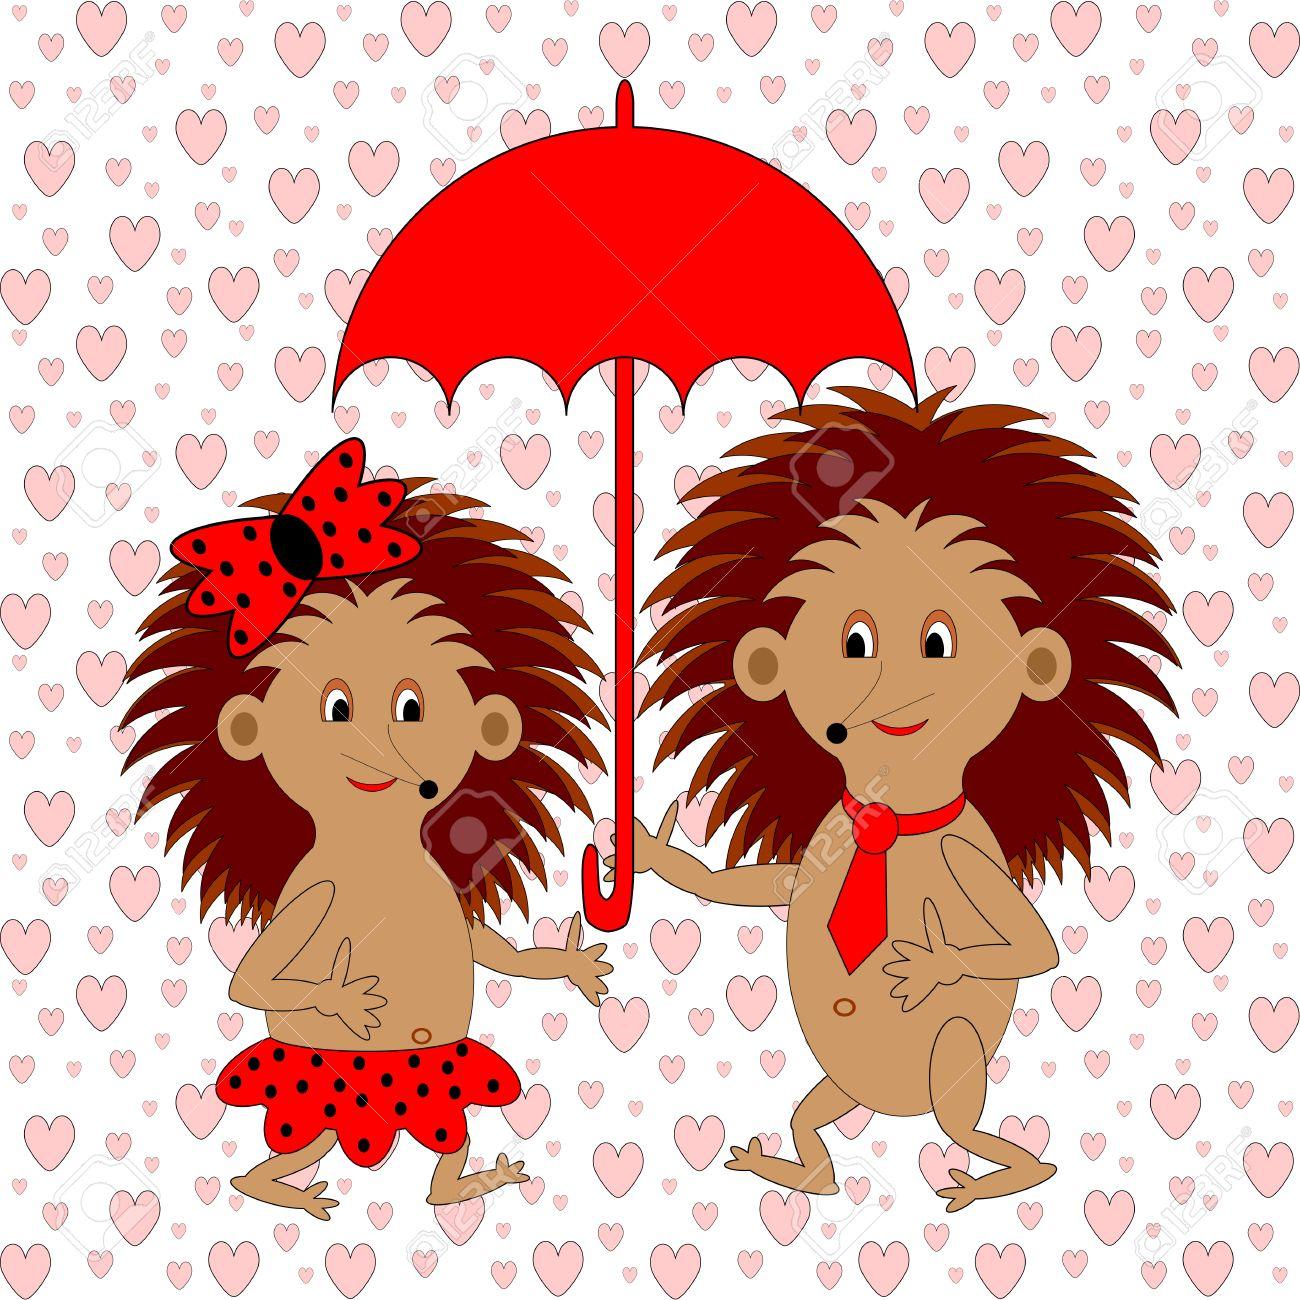 A Funny Cartoon Couple With Umbrella Under The Rain Of Hearts